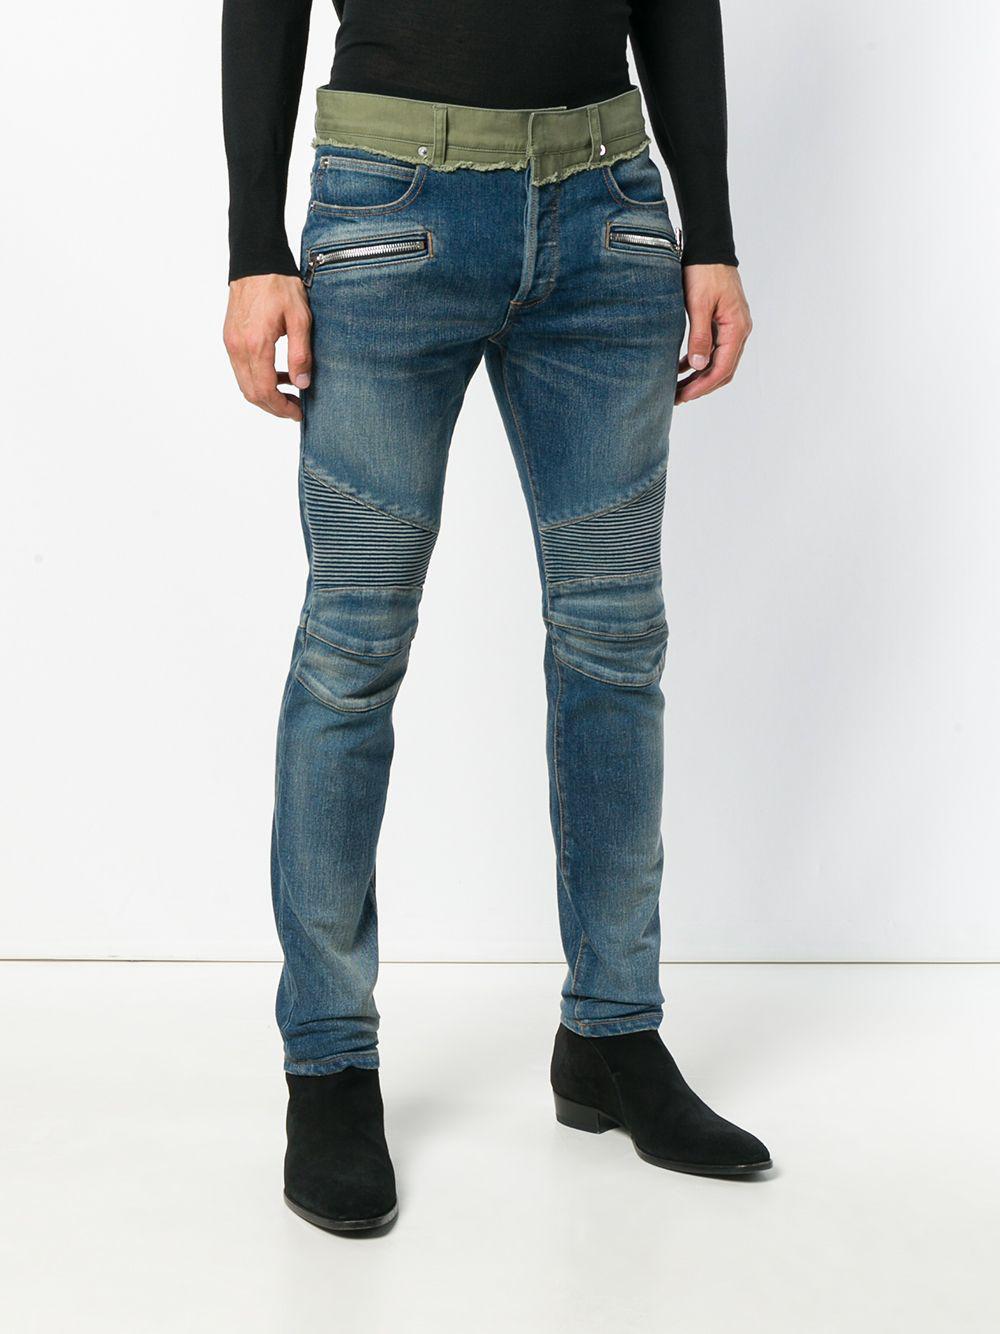 7bc944f8 Balmain - Blue Biker Skinny Jeans for Men - Lyst. View fullscreen